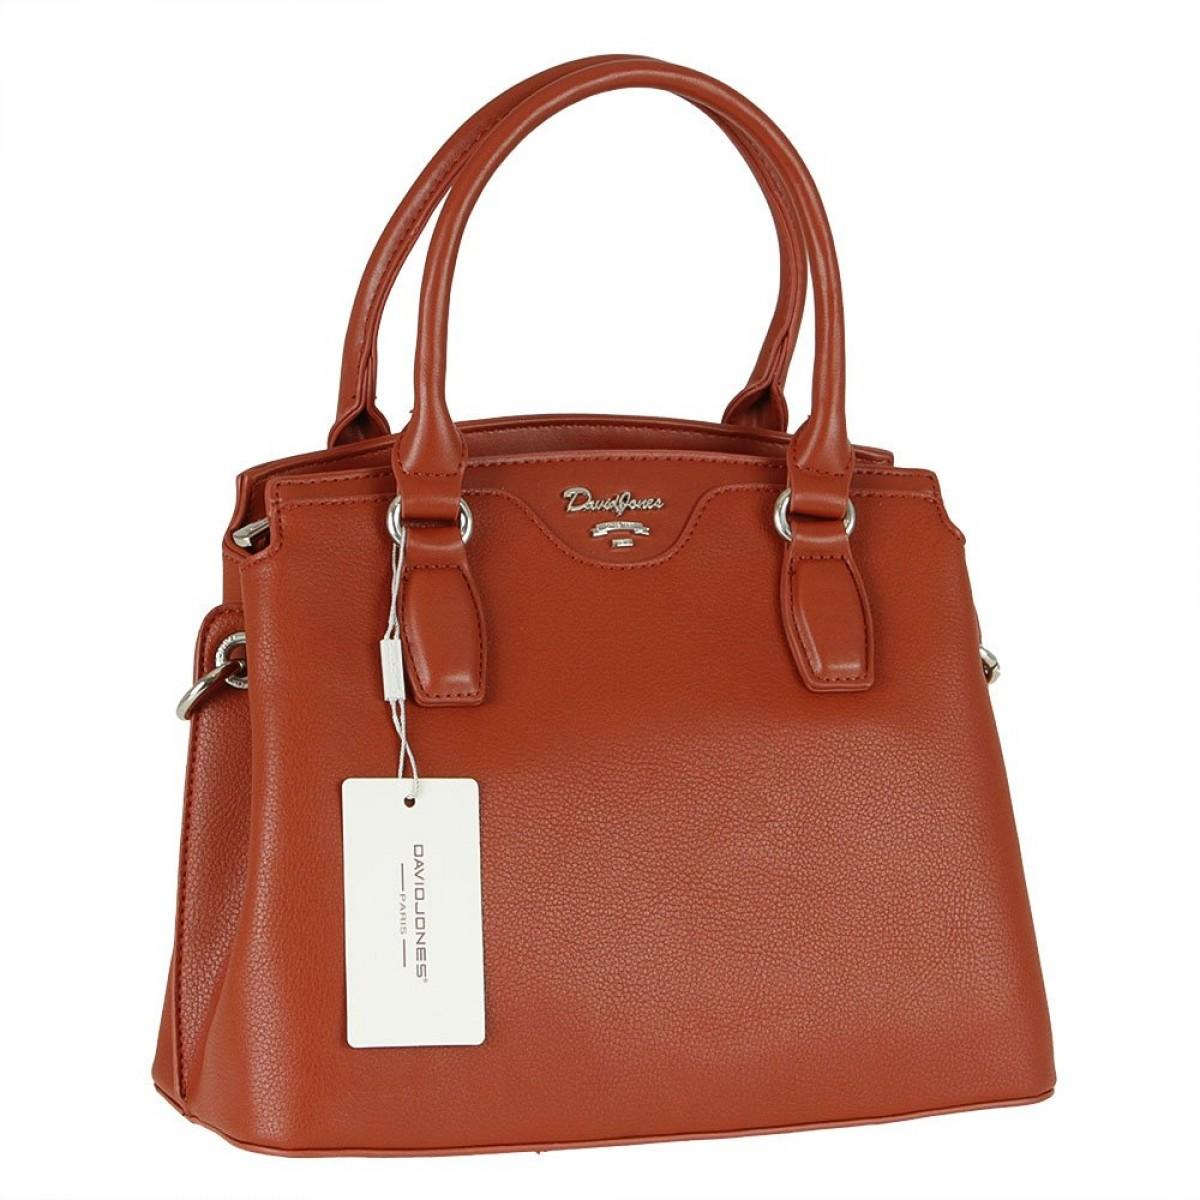 Жіноча сумка David Jones 6416-1 SIENNA